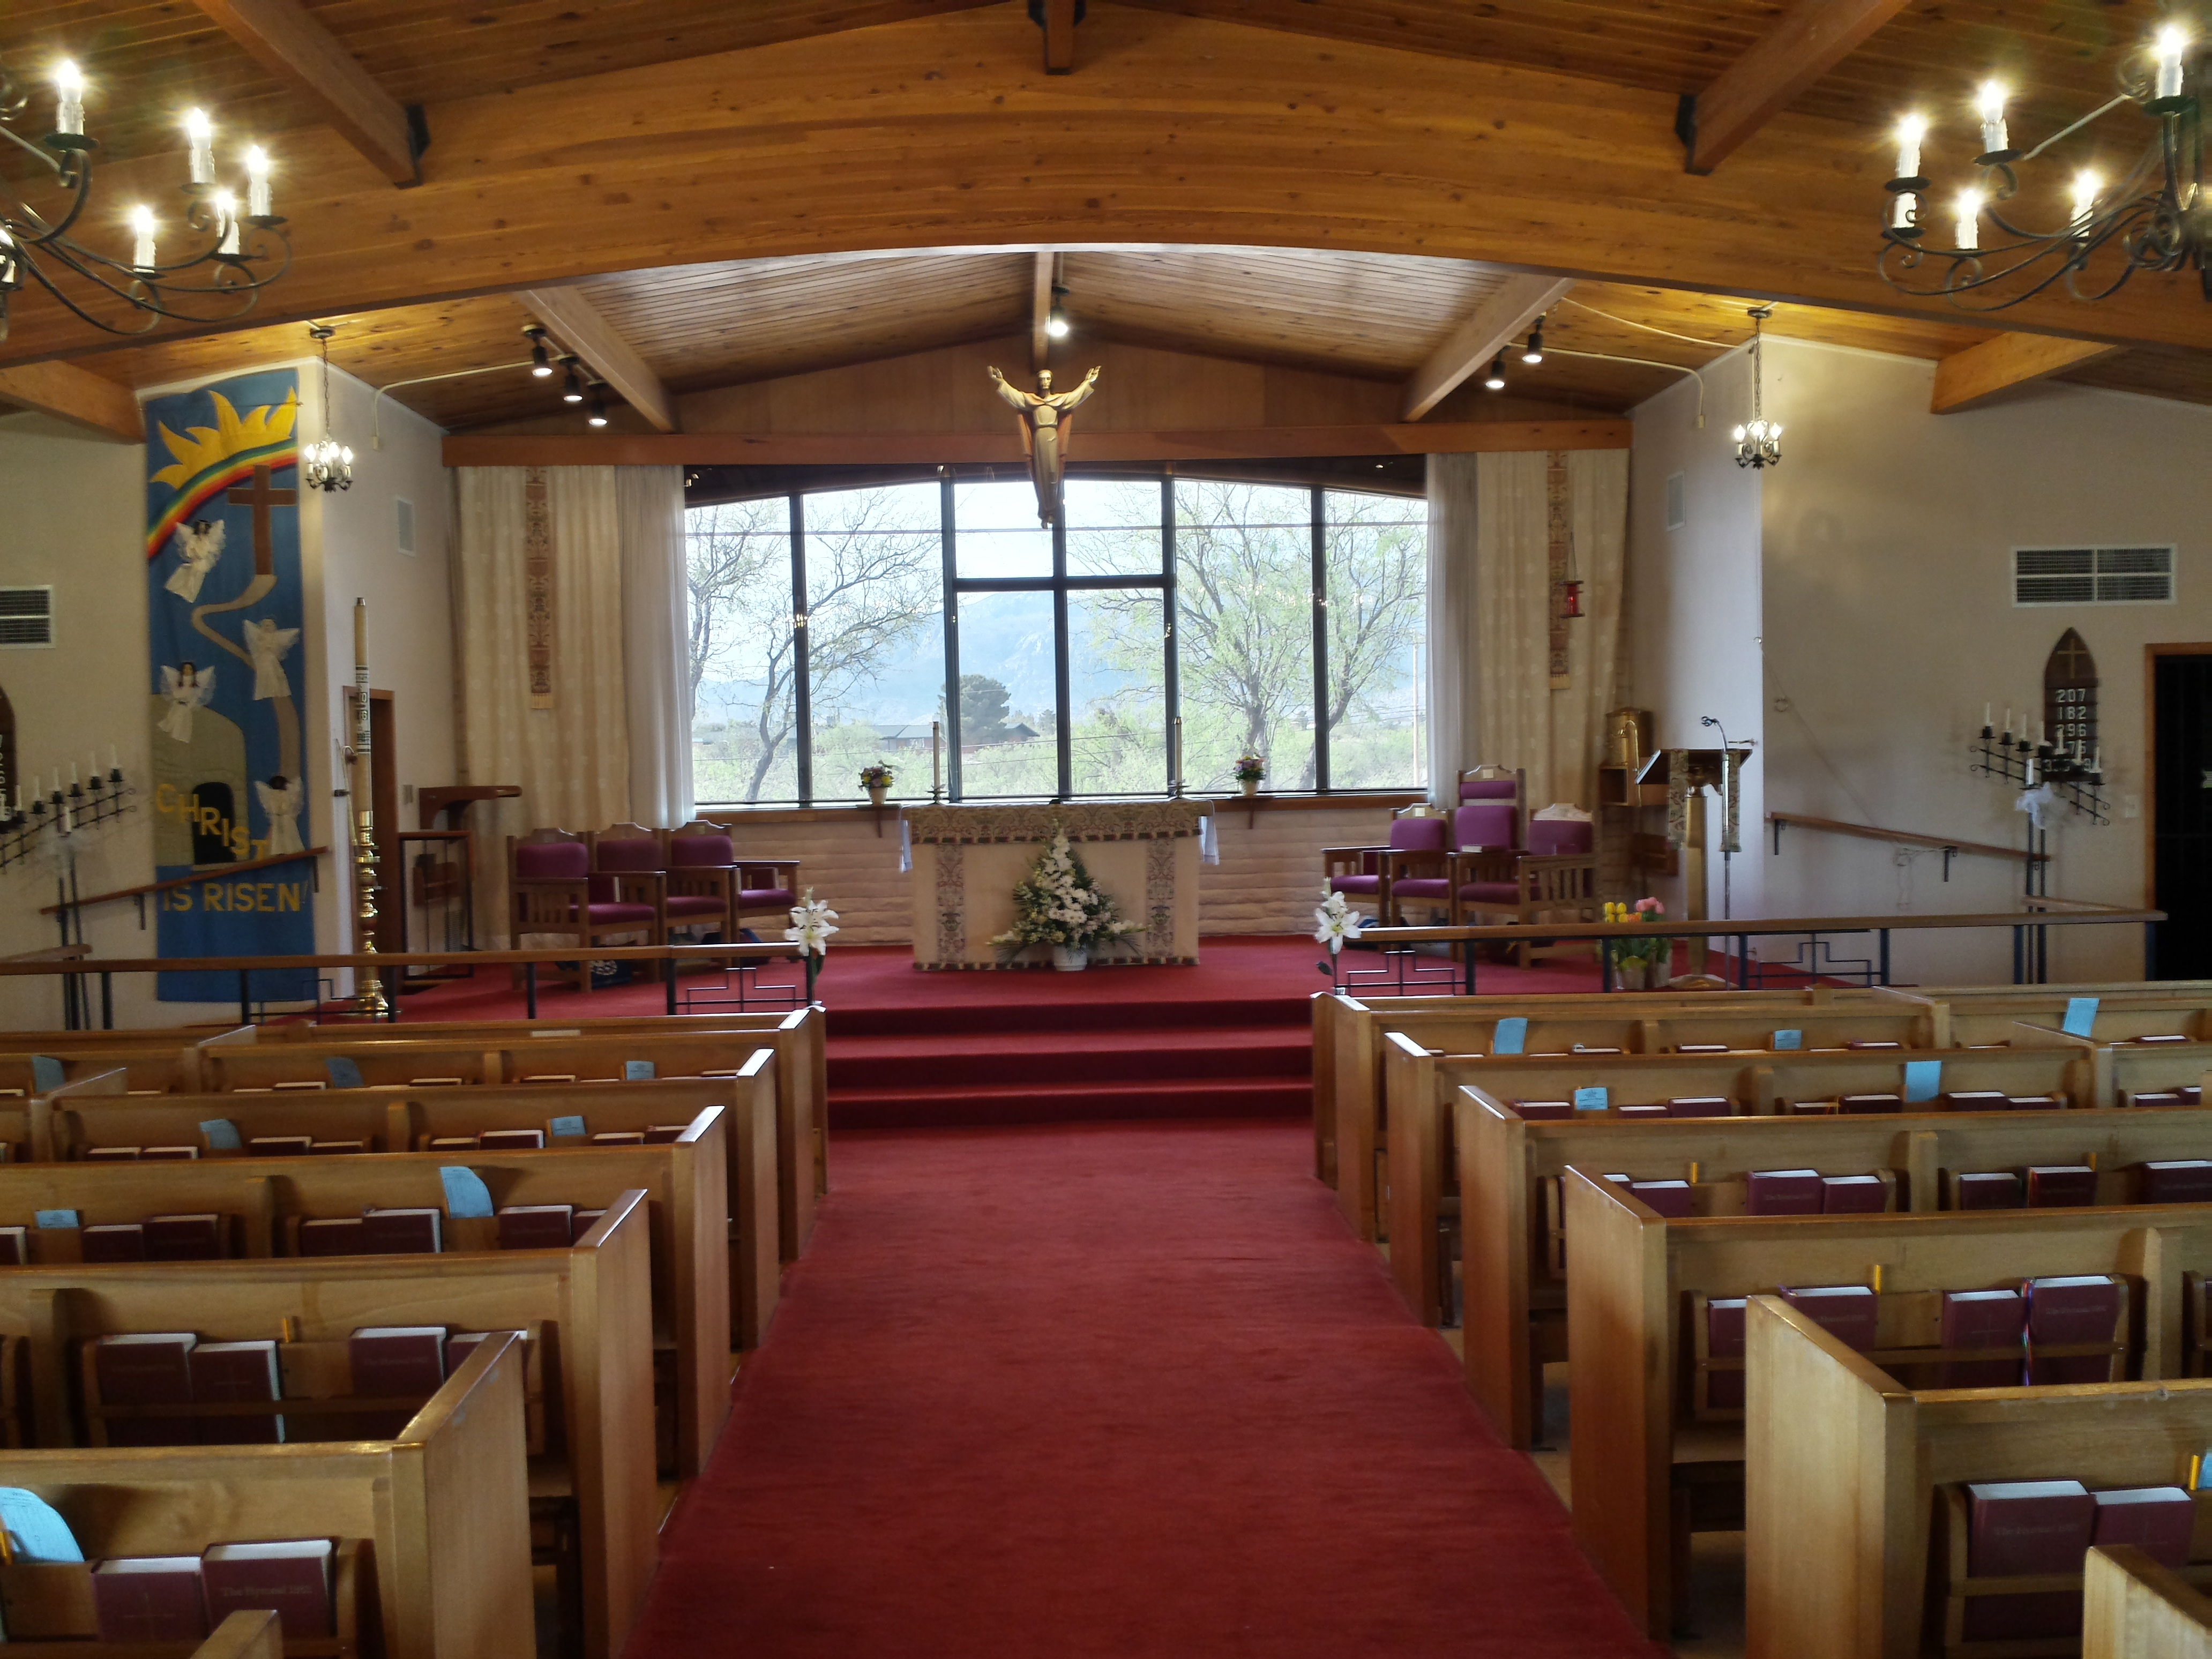 A new Altar area